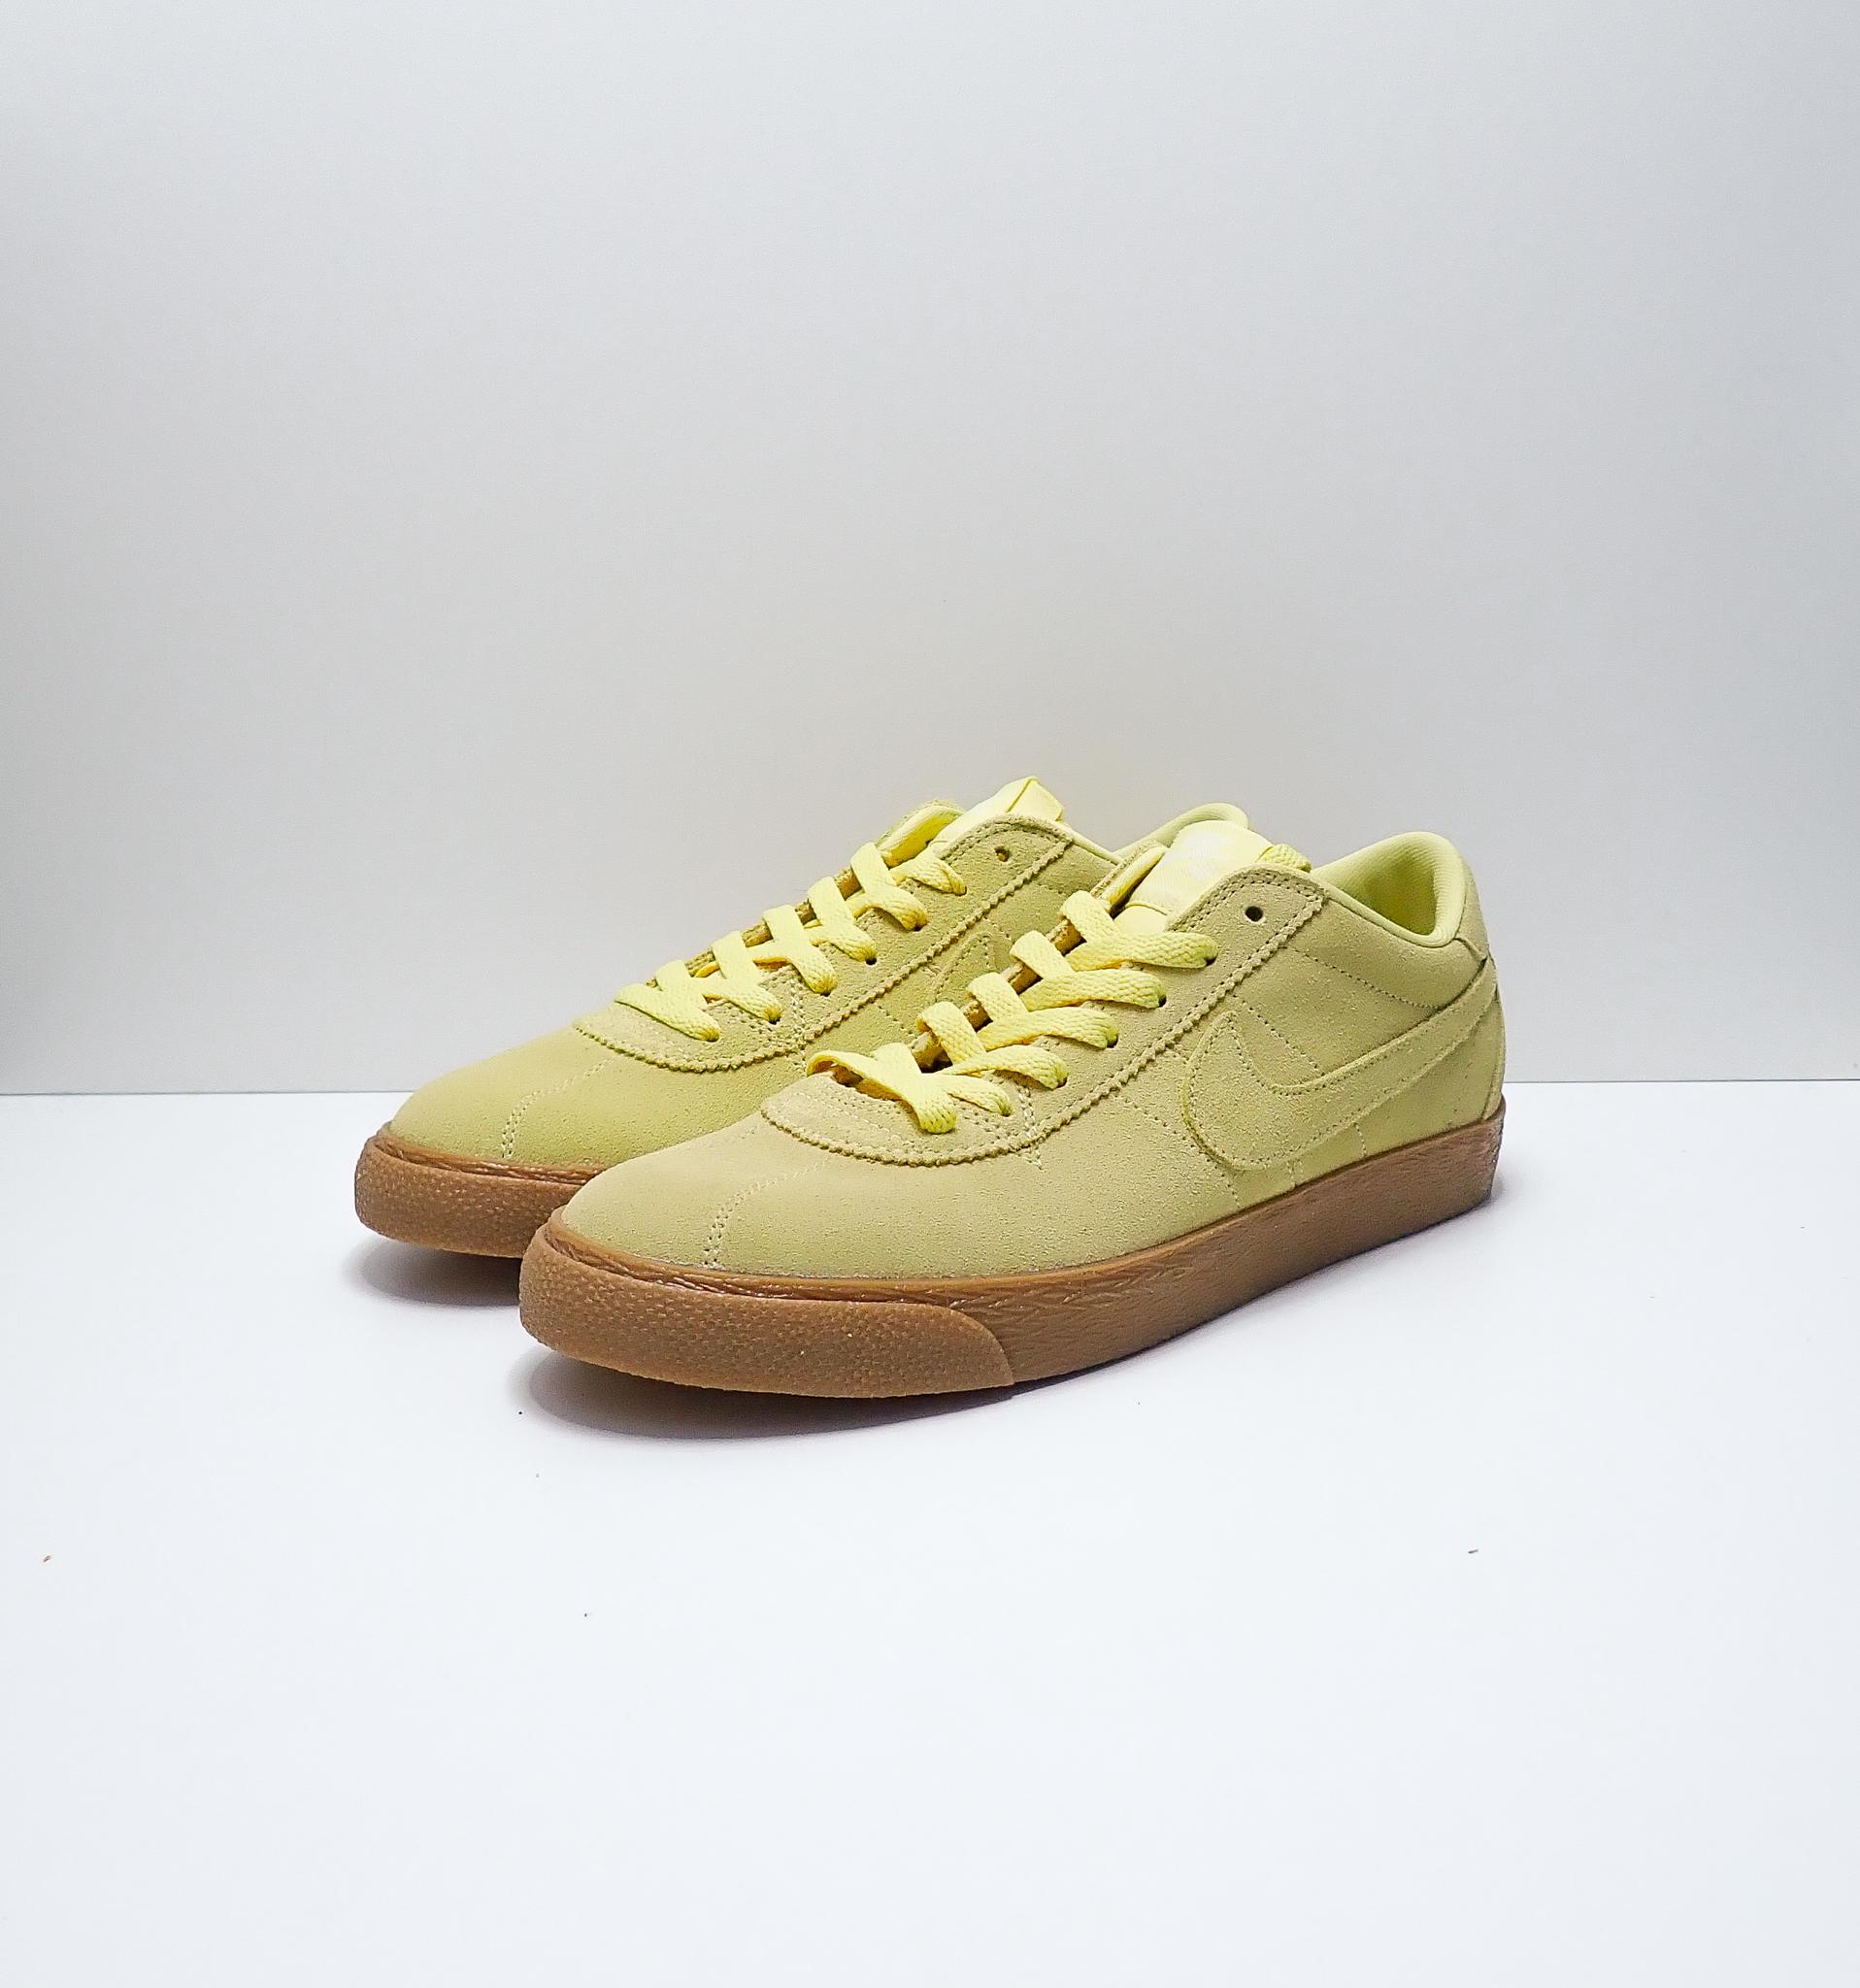 Nike SB Zoom Bruin Premium SE Lemon Wash